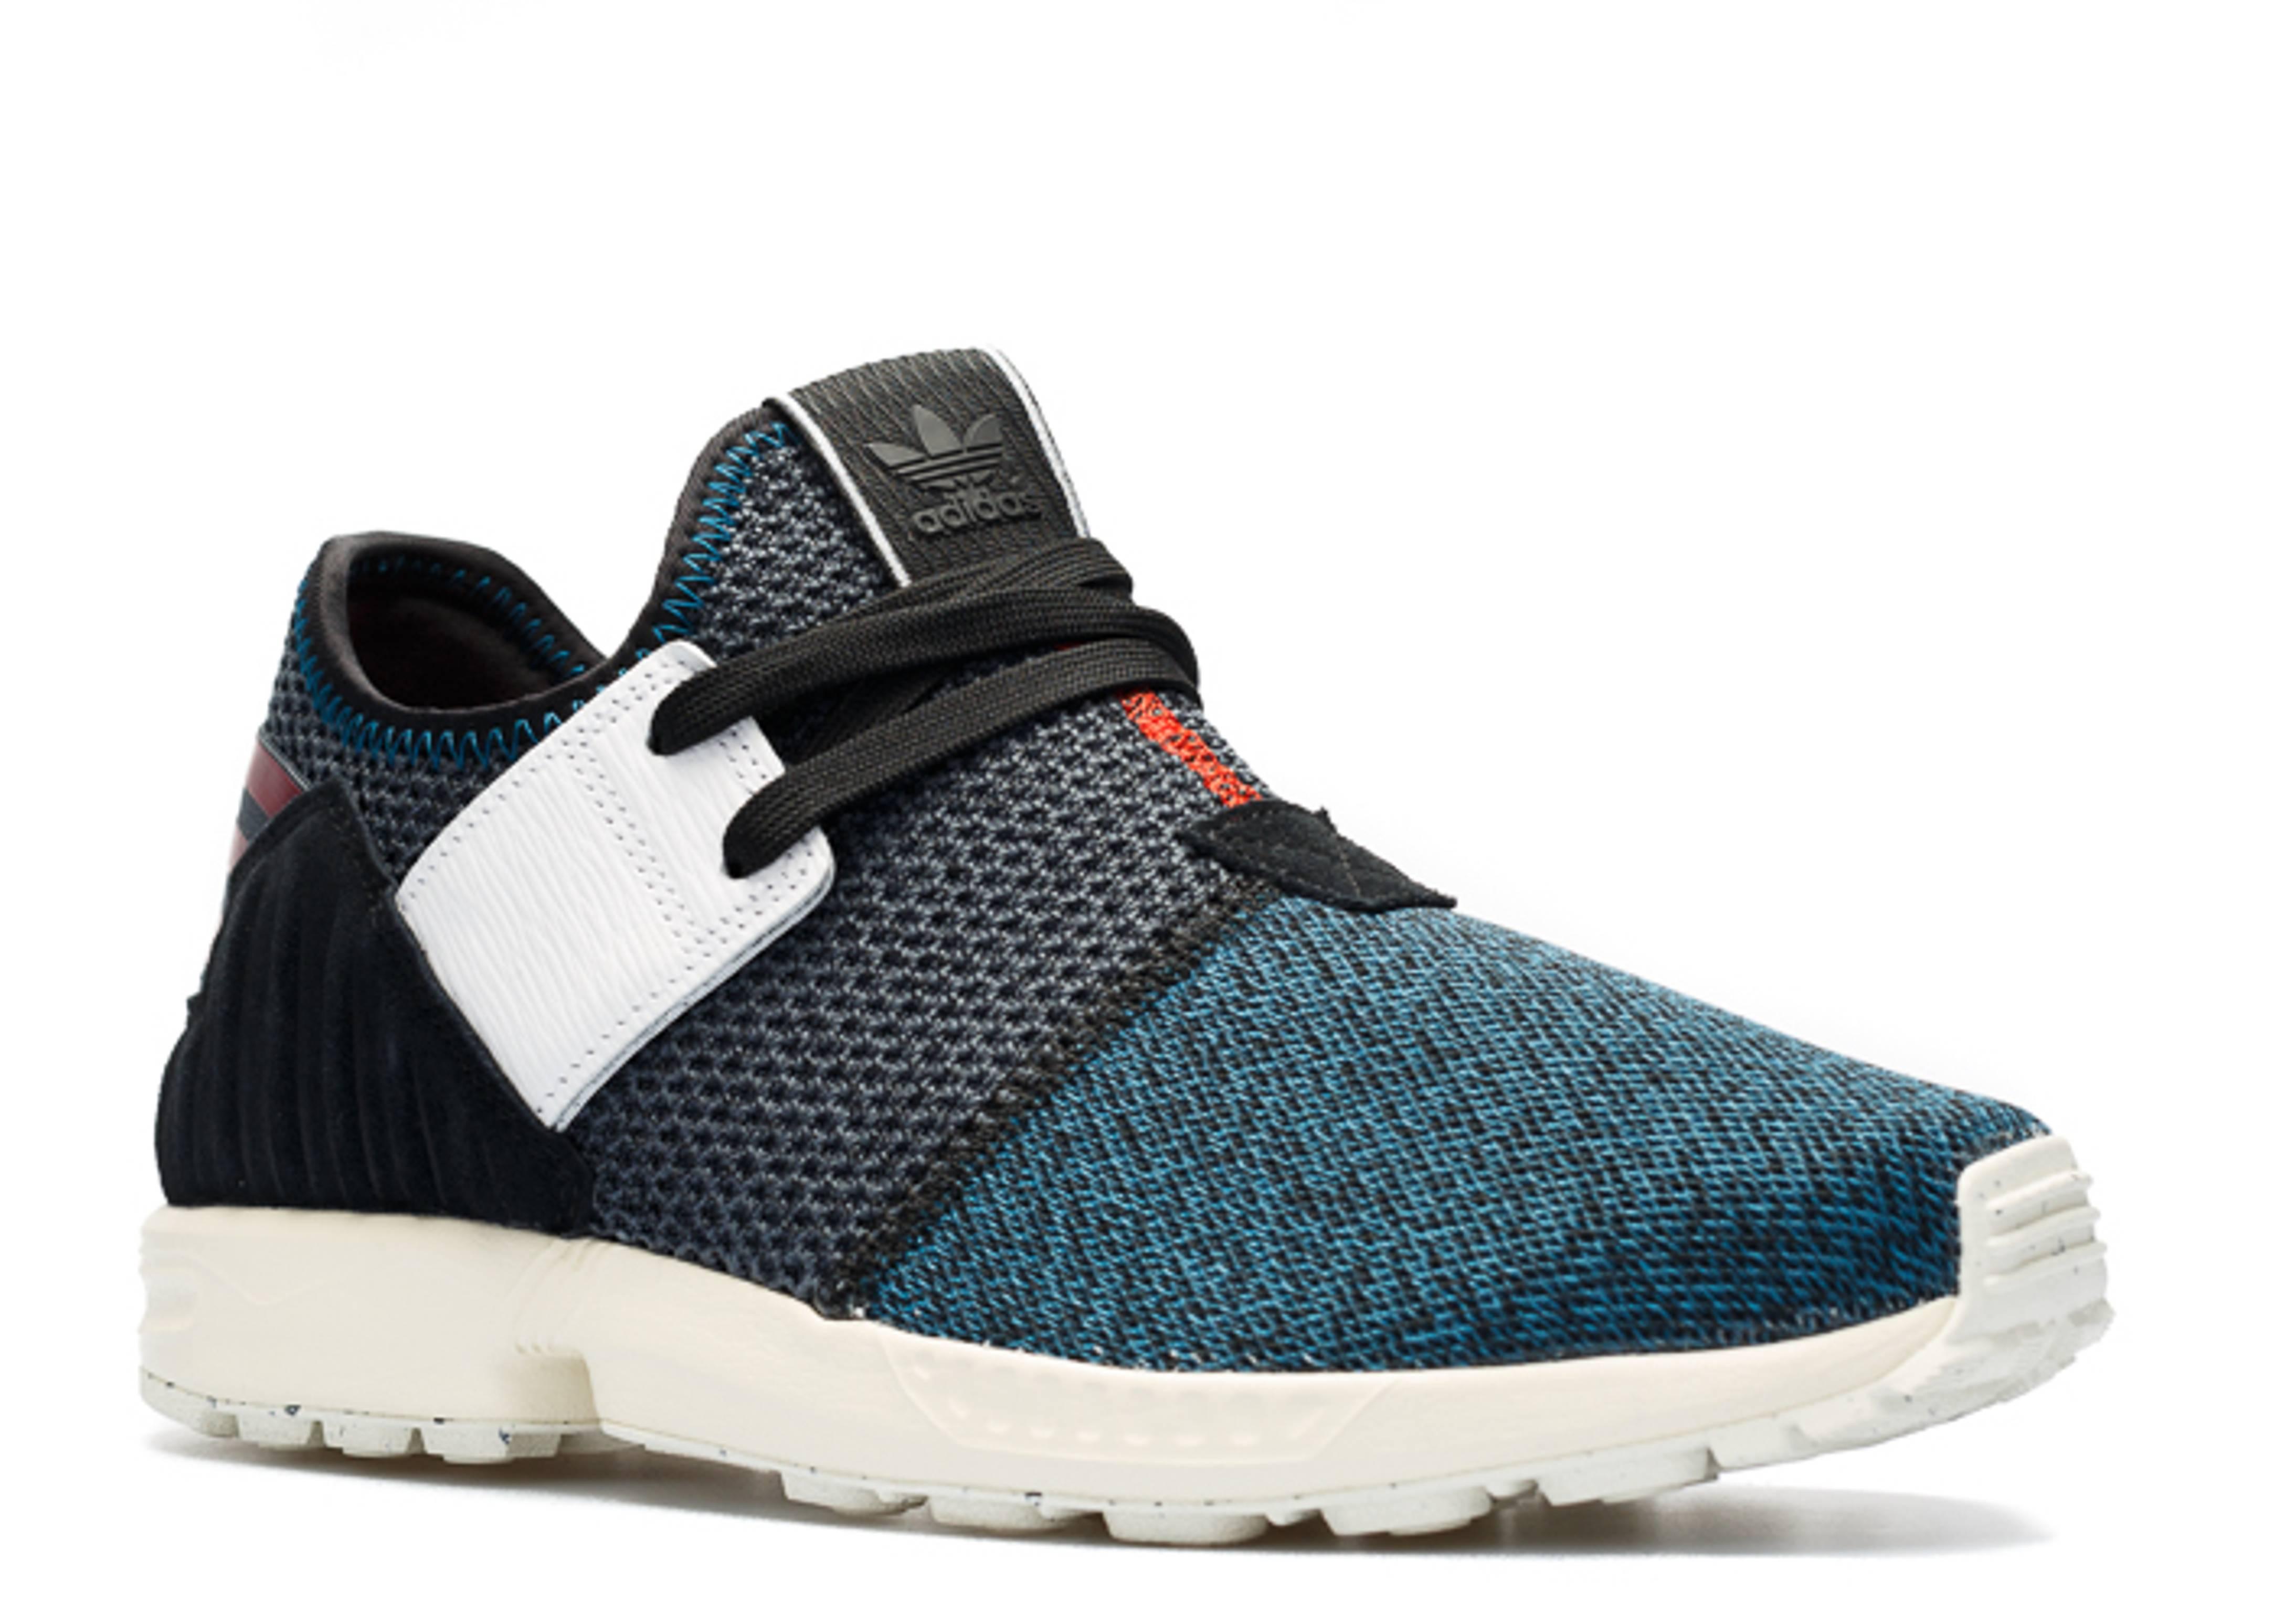 adidas Originals ZX Flux Plus Shoes Trainers Black AQ5398 US 11 2